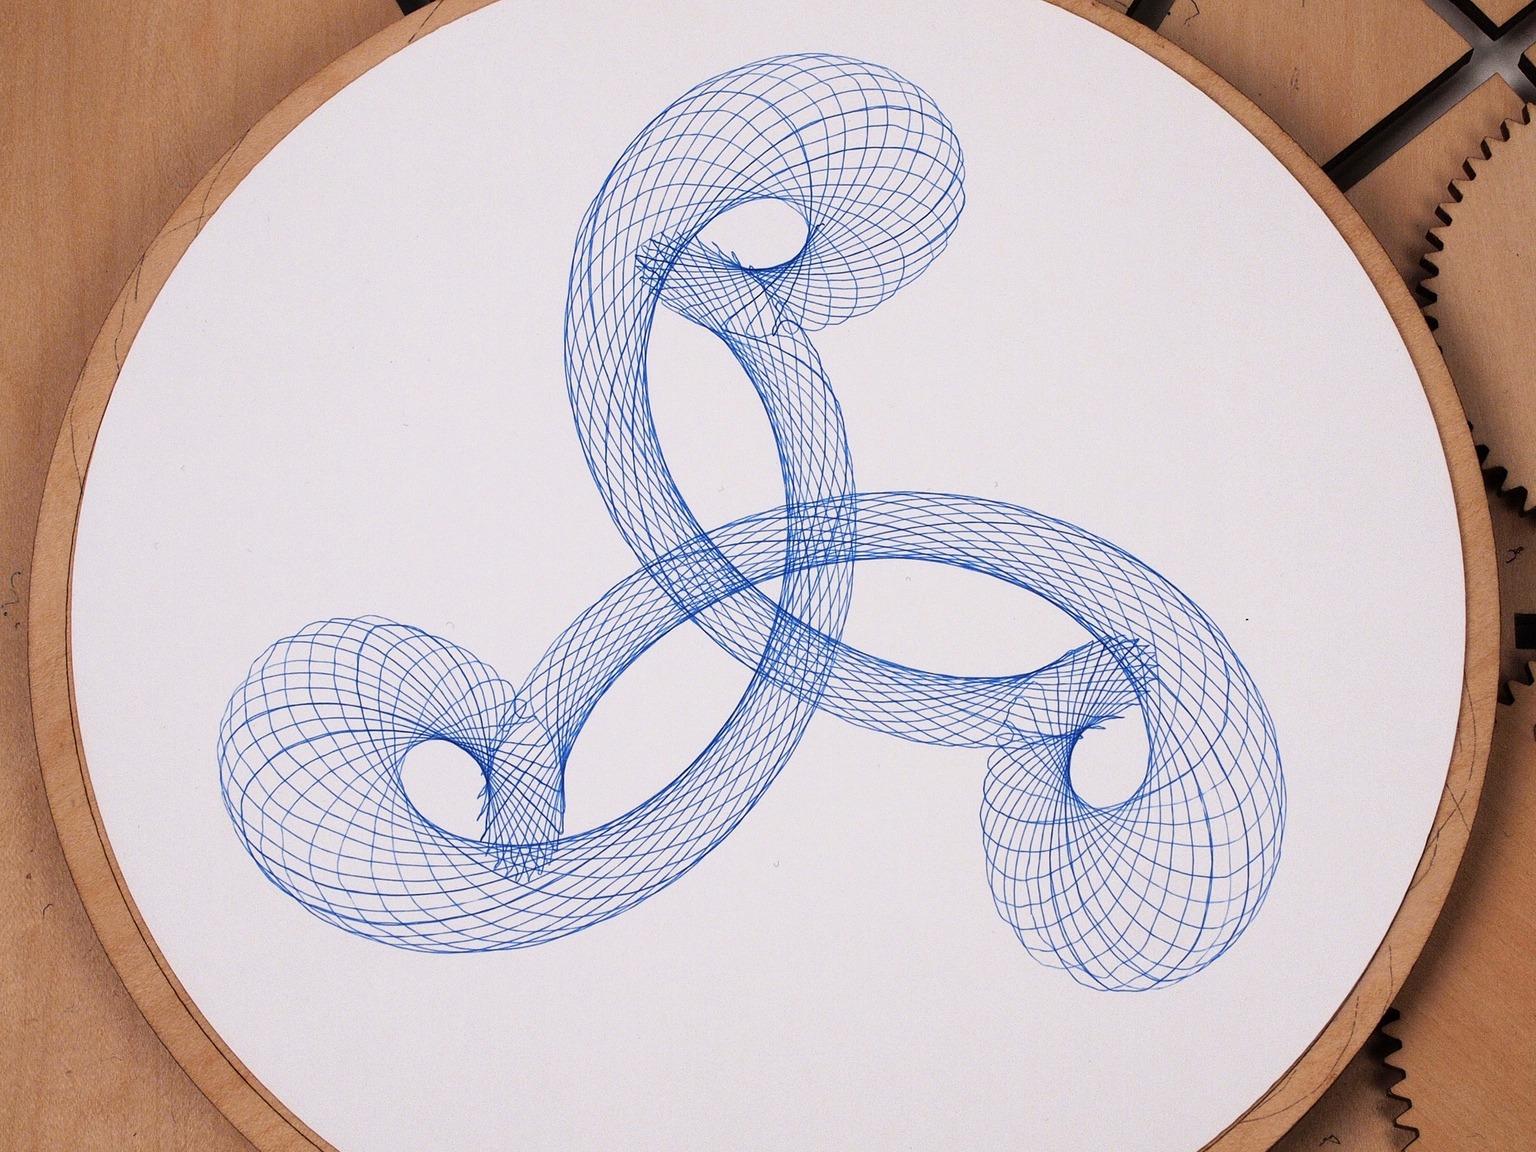 wood-cycloid-drawing-machine-01